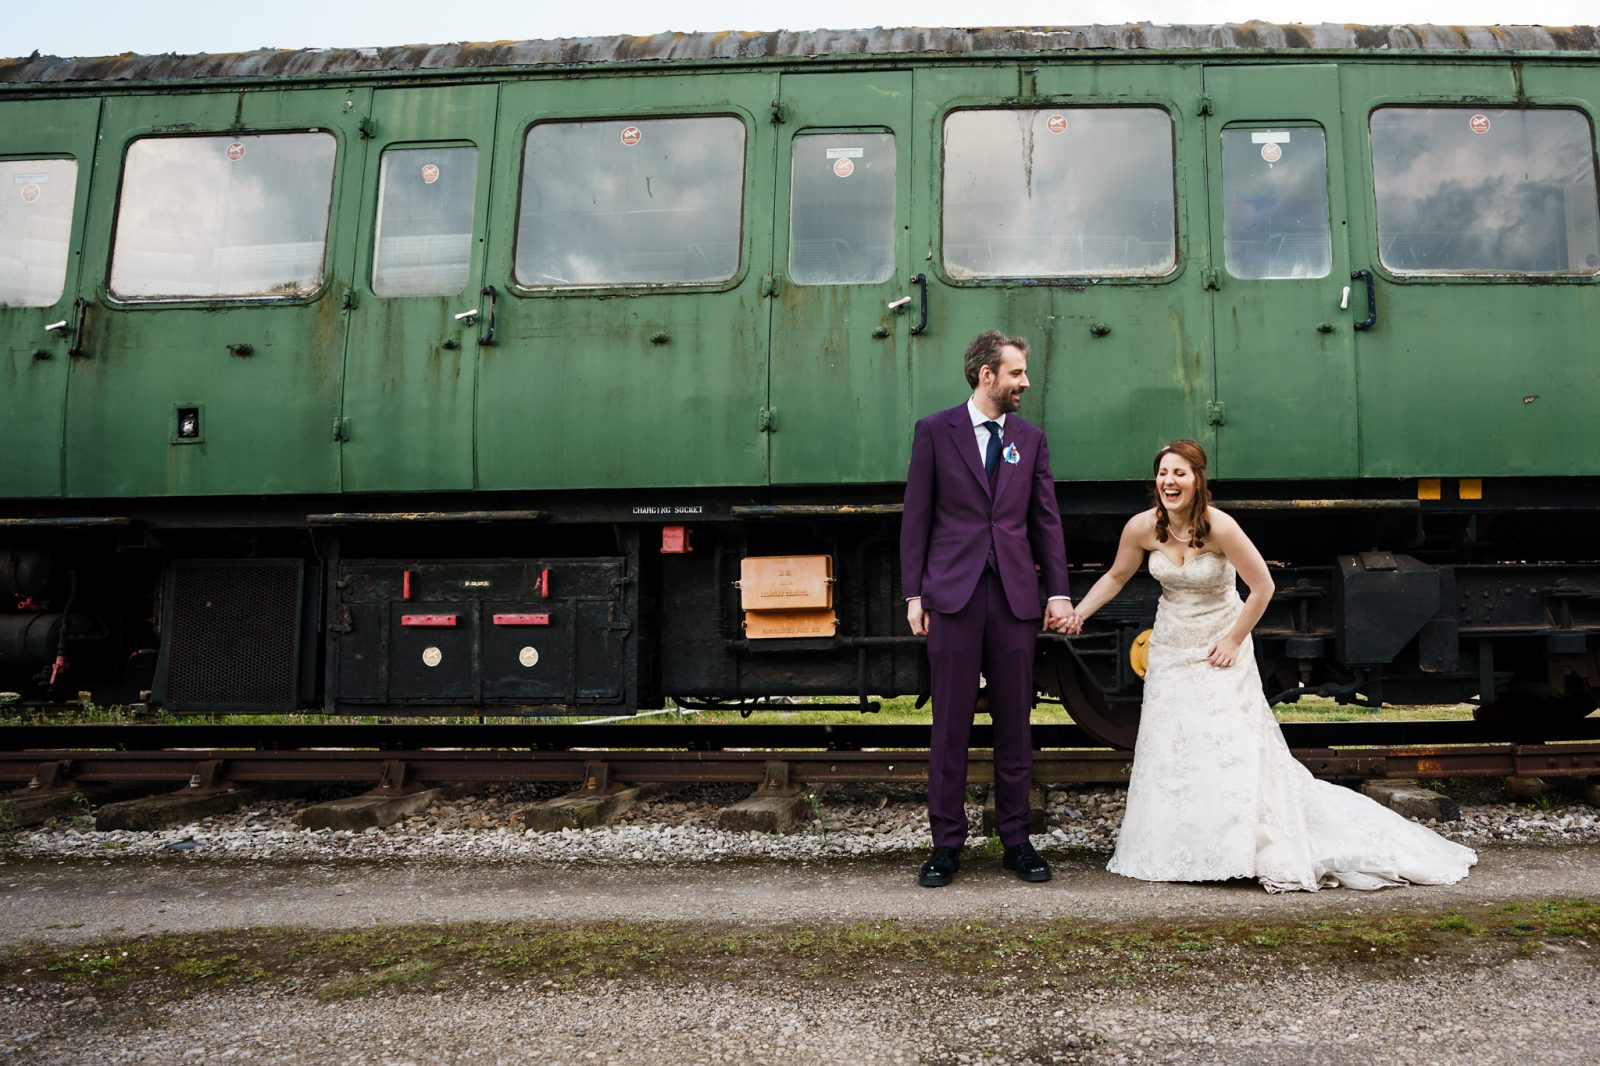 laughing-bride-green-vintage-train-Bucks-Railway-Centre